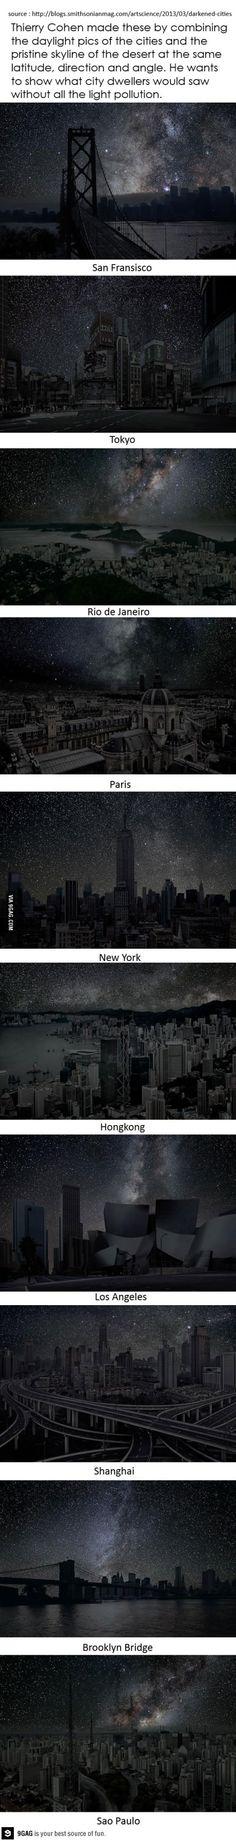 Cities pure night skyline